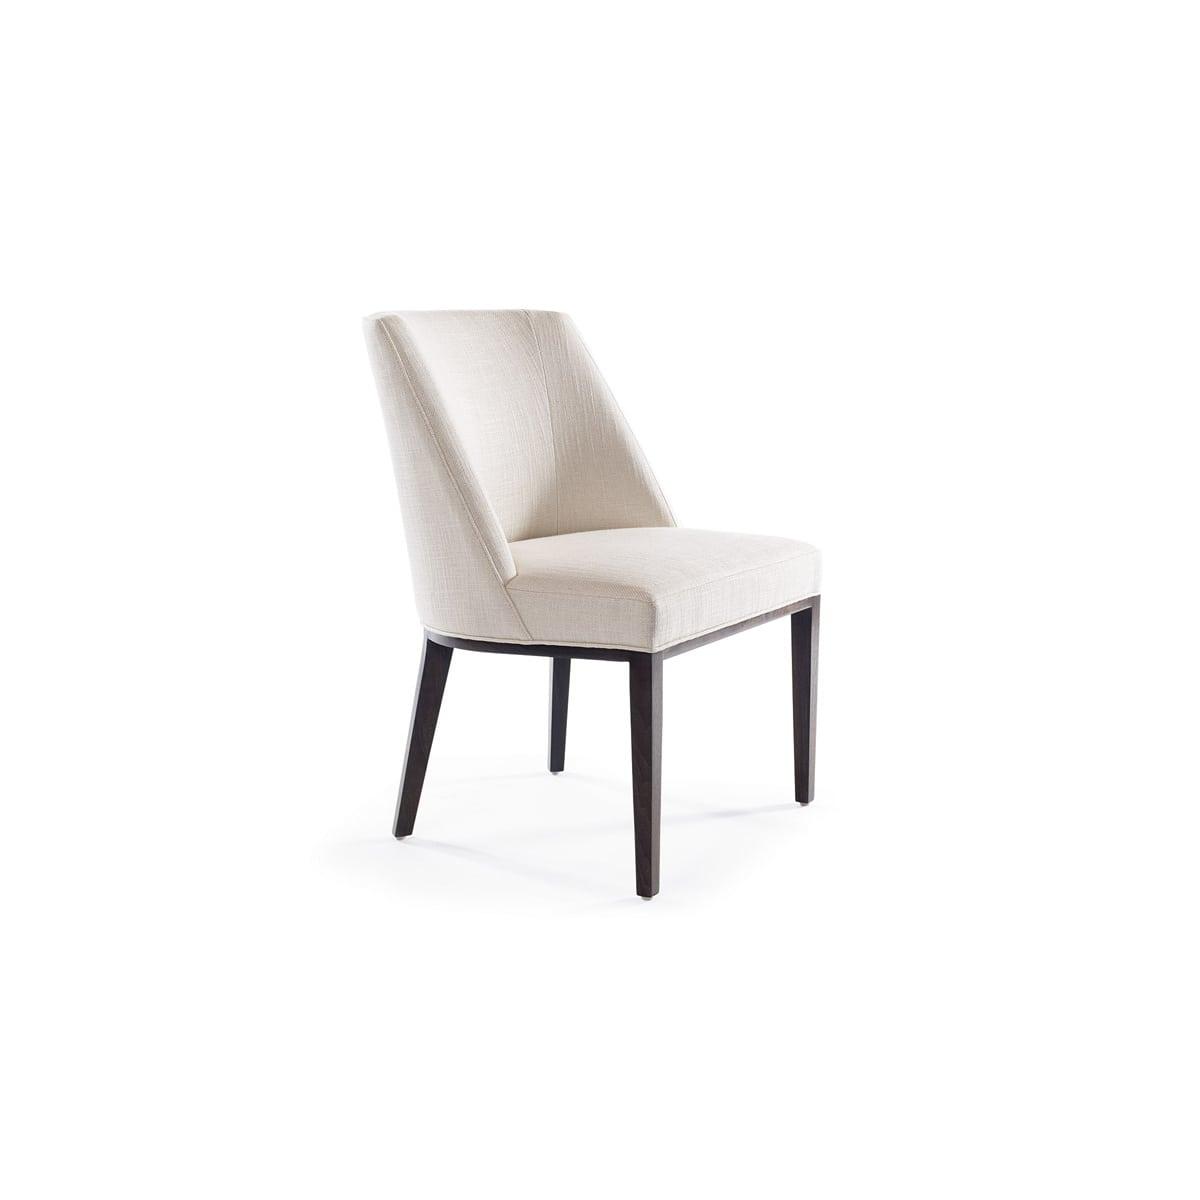 Bright Chair Eno Side Chair